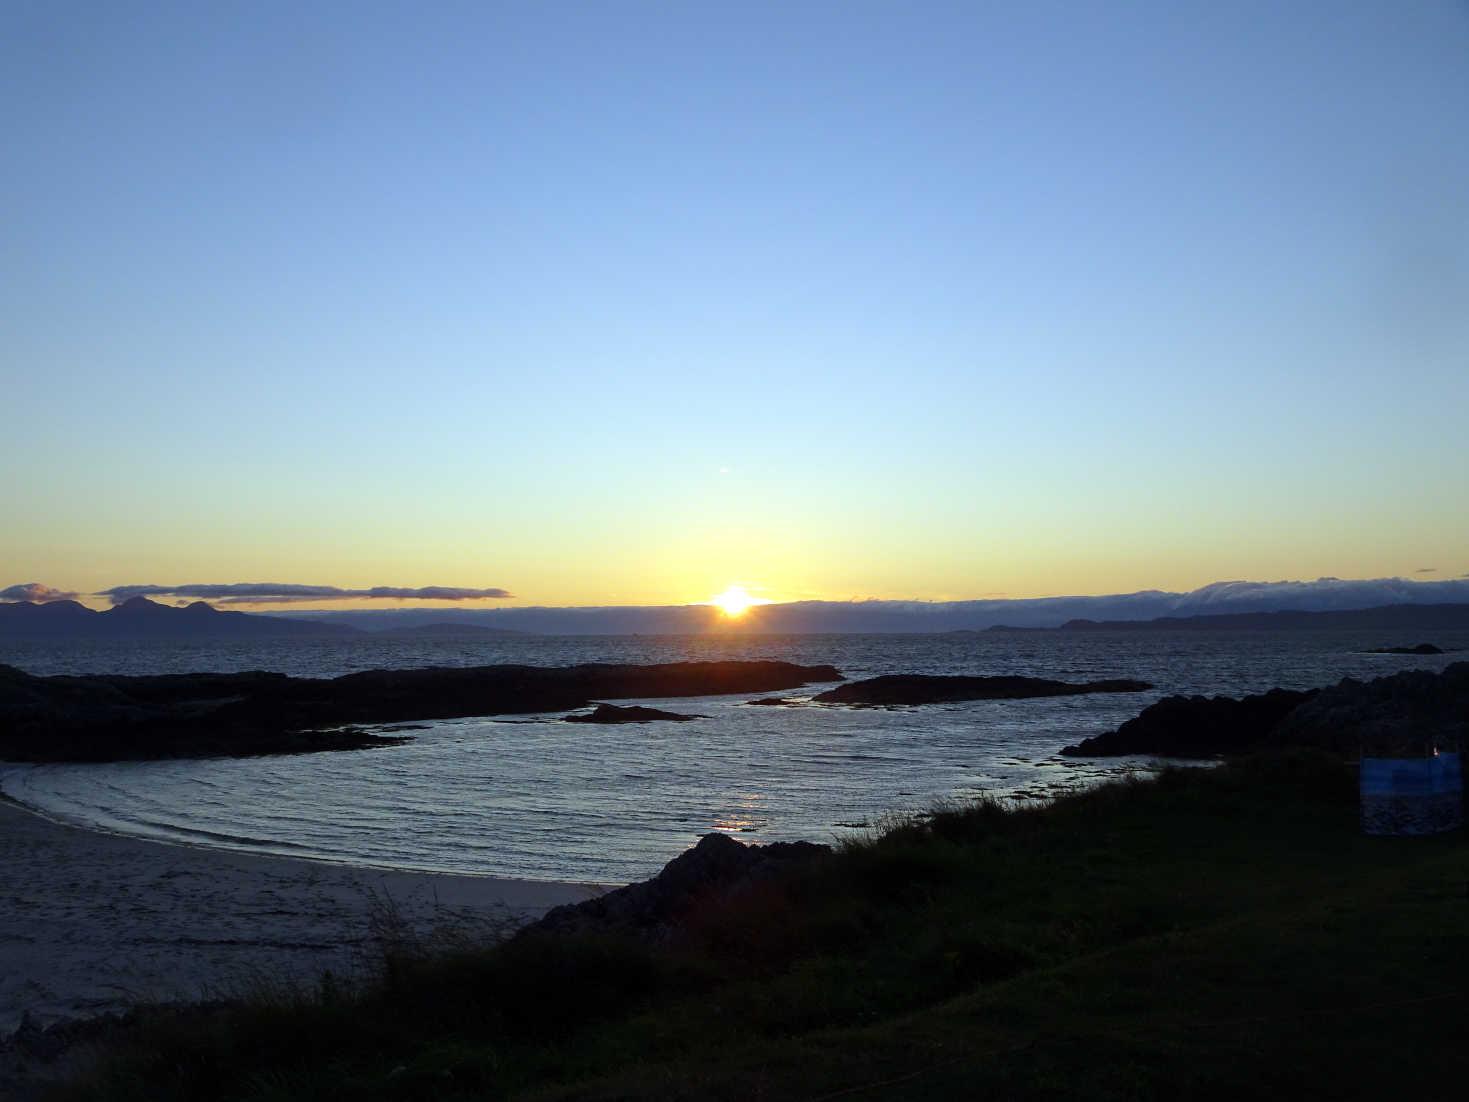 sunset getting better at silversands